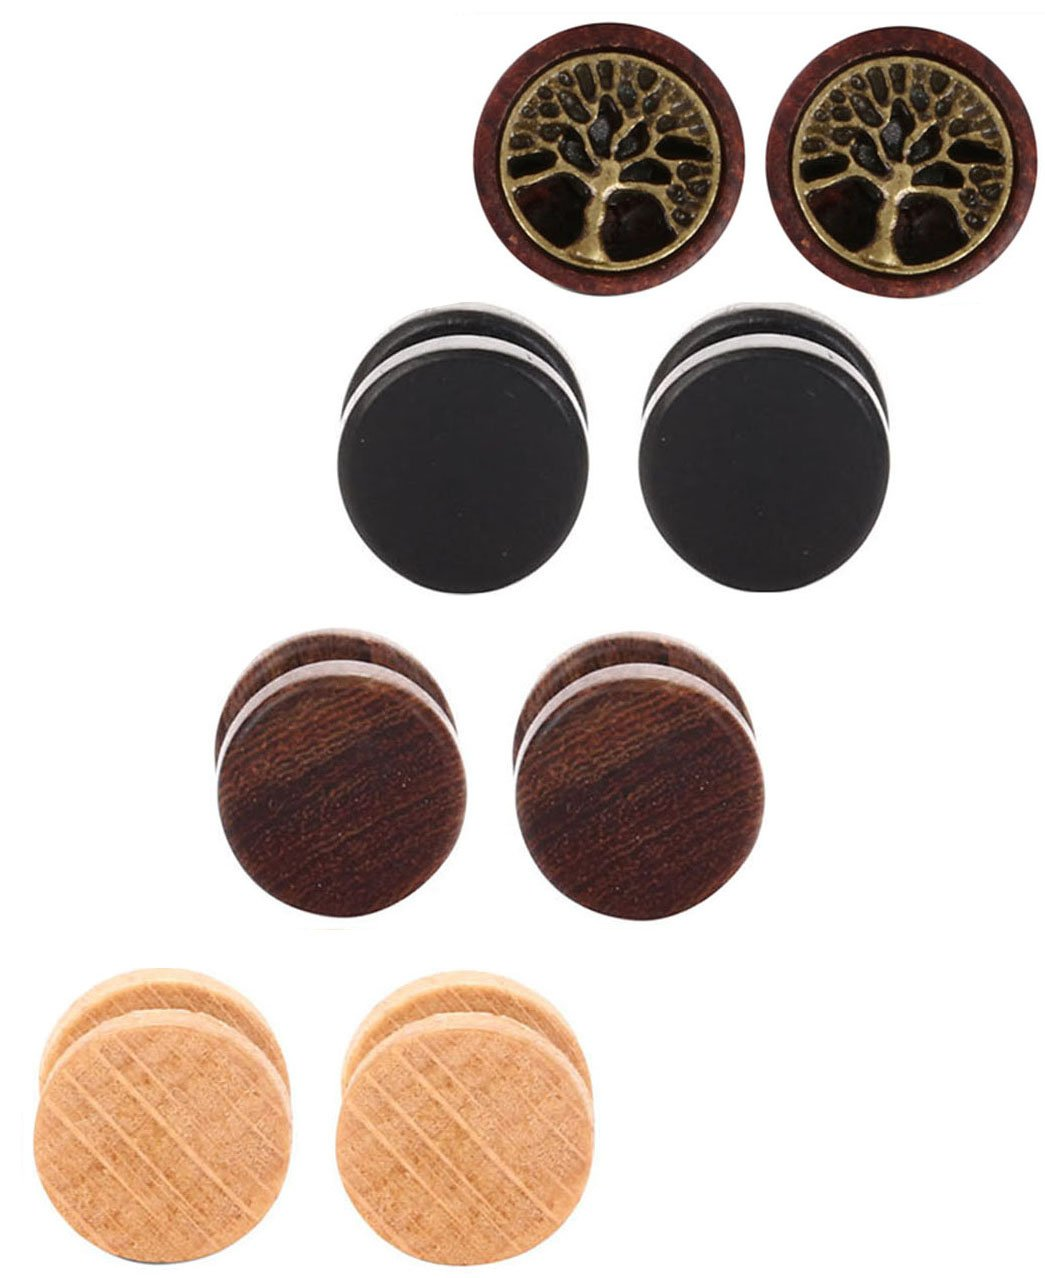 Tanyoyo Wood Cheater Fake Ear Plugs Gauges Illusion Screw Stud Earrings 3pair a set (10mm:3 pair +1 pair tree of Life)